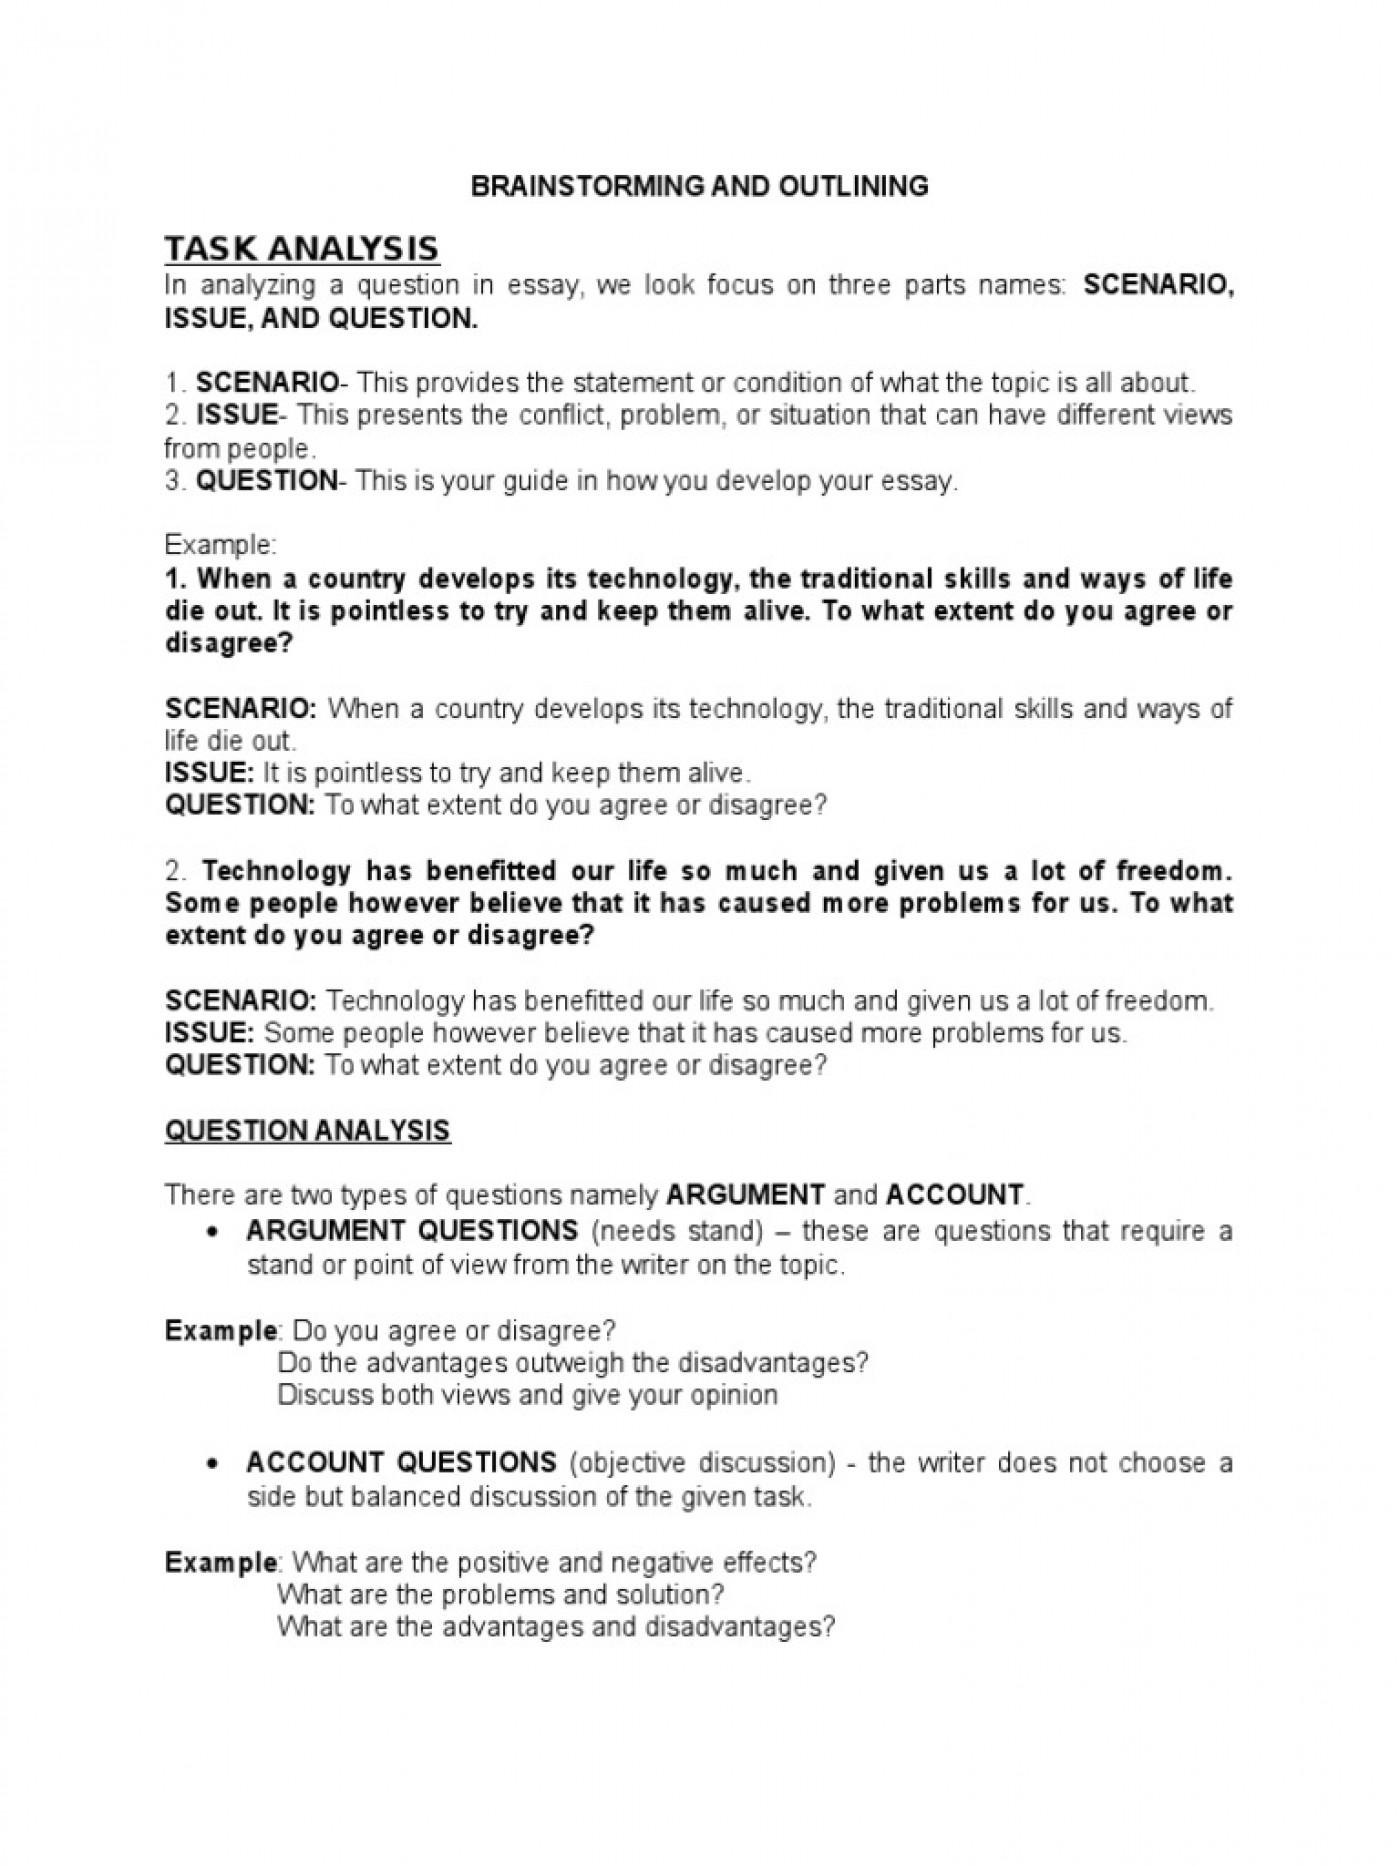 011 Quiz Worksheet Why Brainstorming S Important Essay